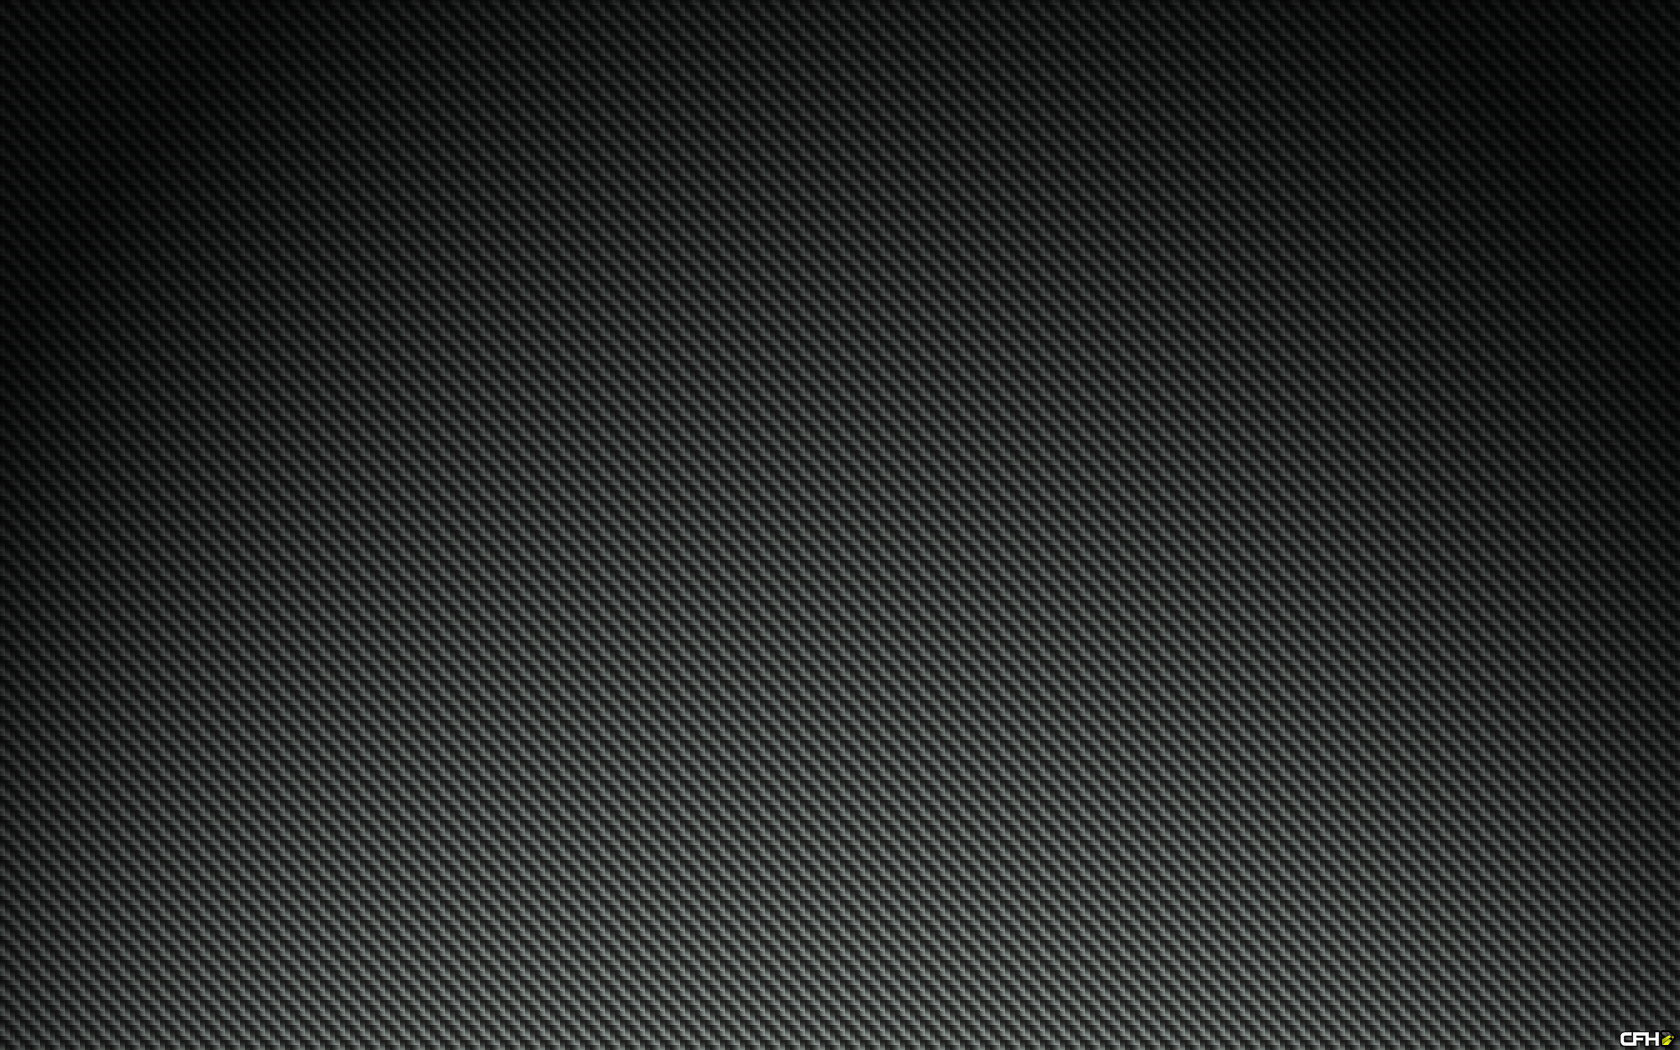 carbon fiber pc bmw carbon fiber wallpaper high quality carbon fiber 1680x1050